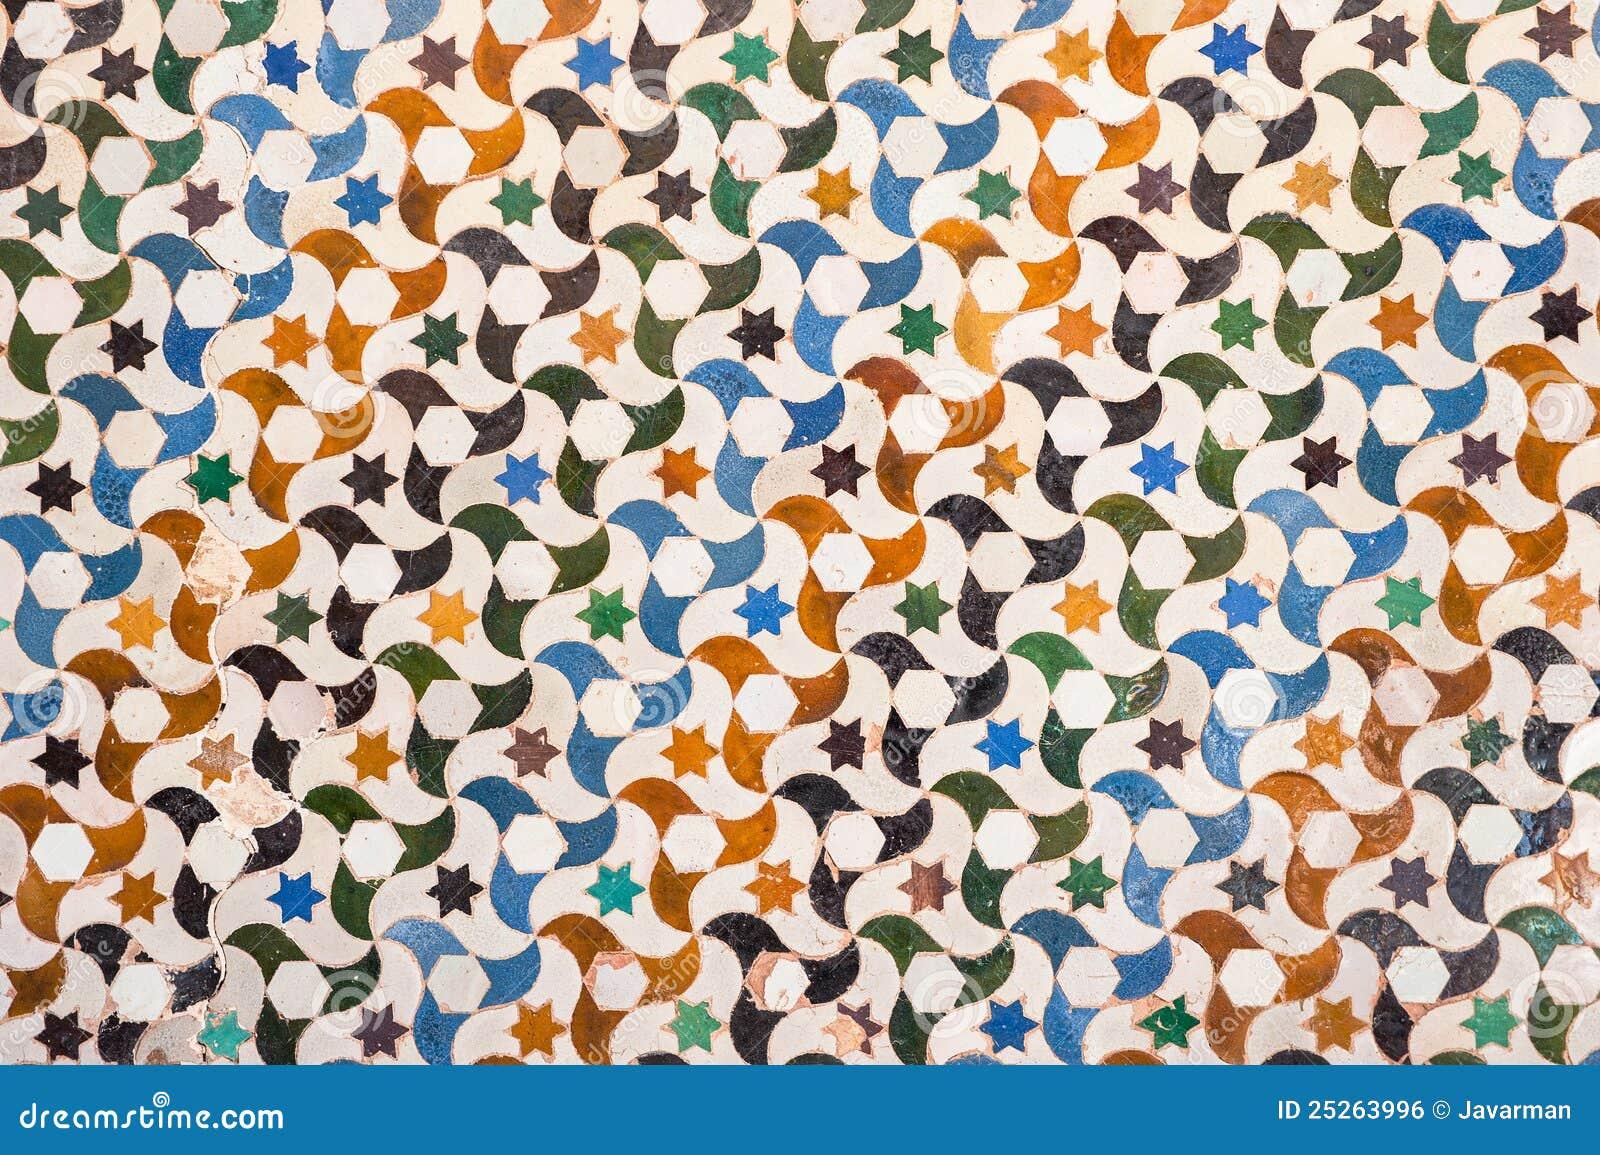 Tile decoration alhambra palace spain stock photo for Alhambra decoration